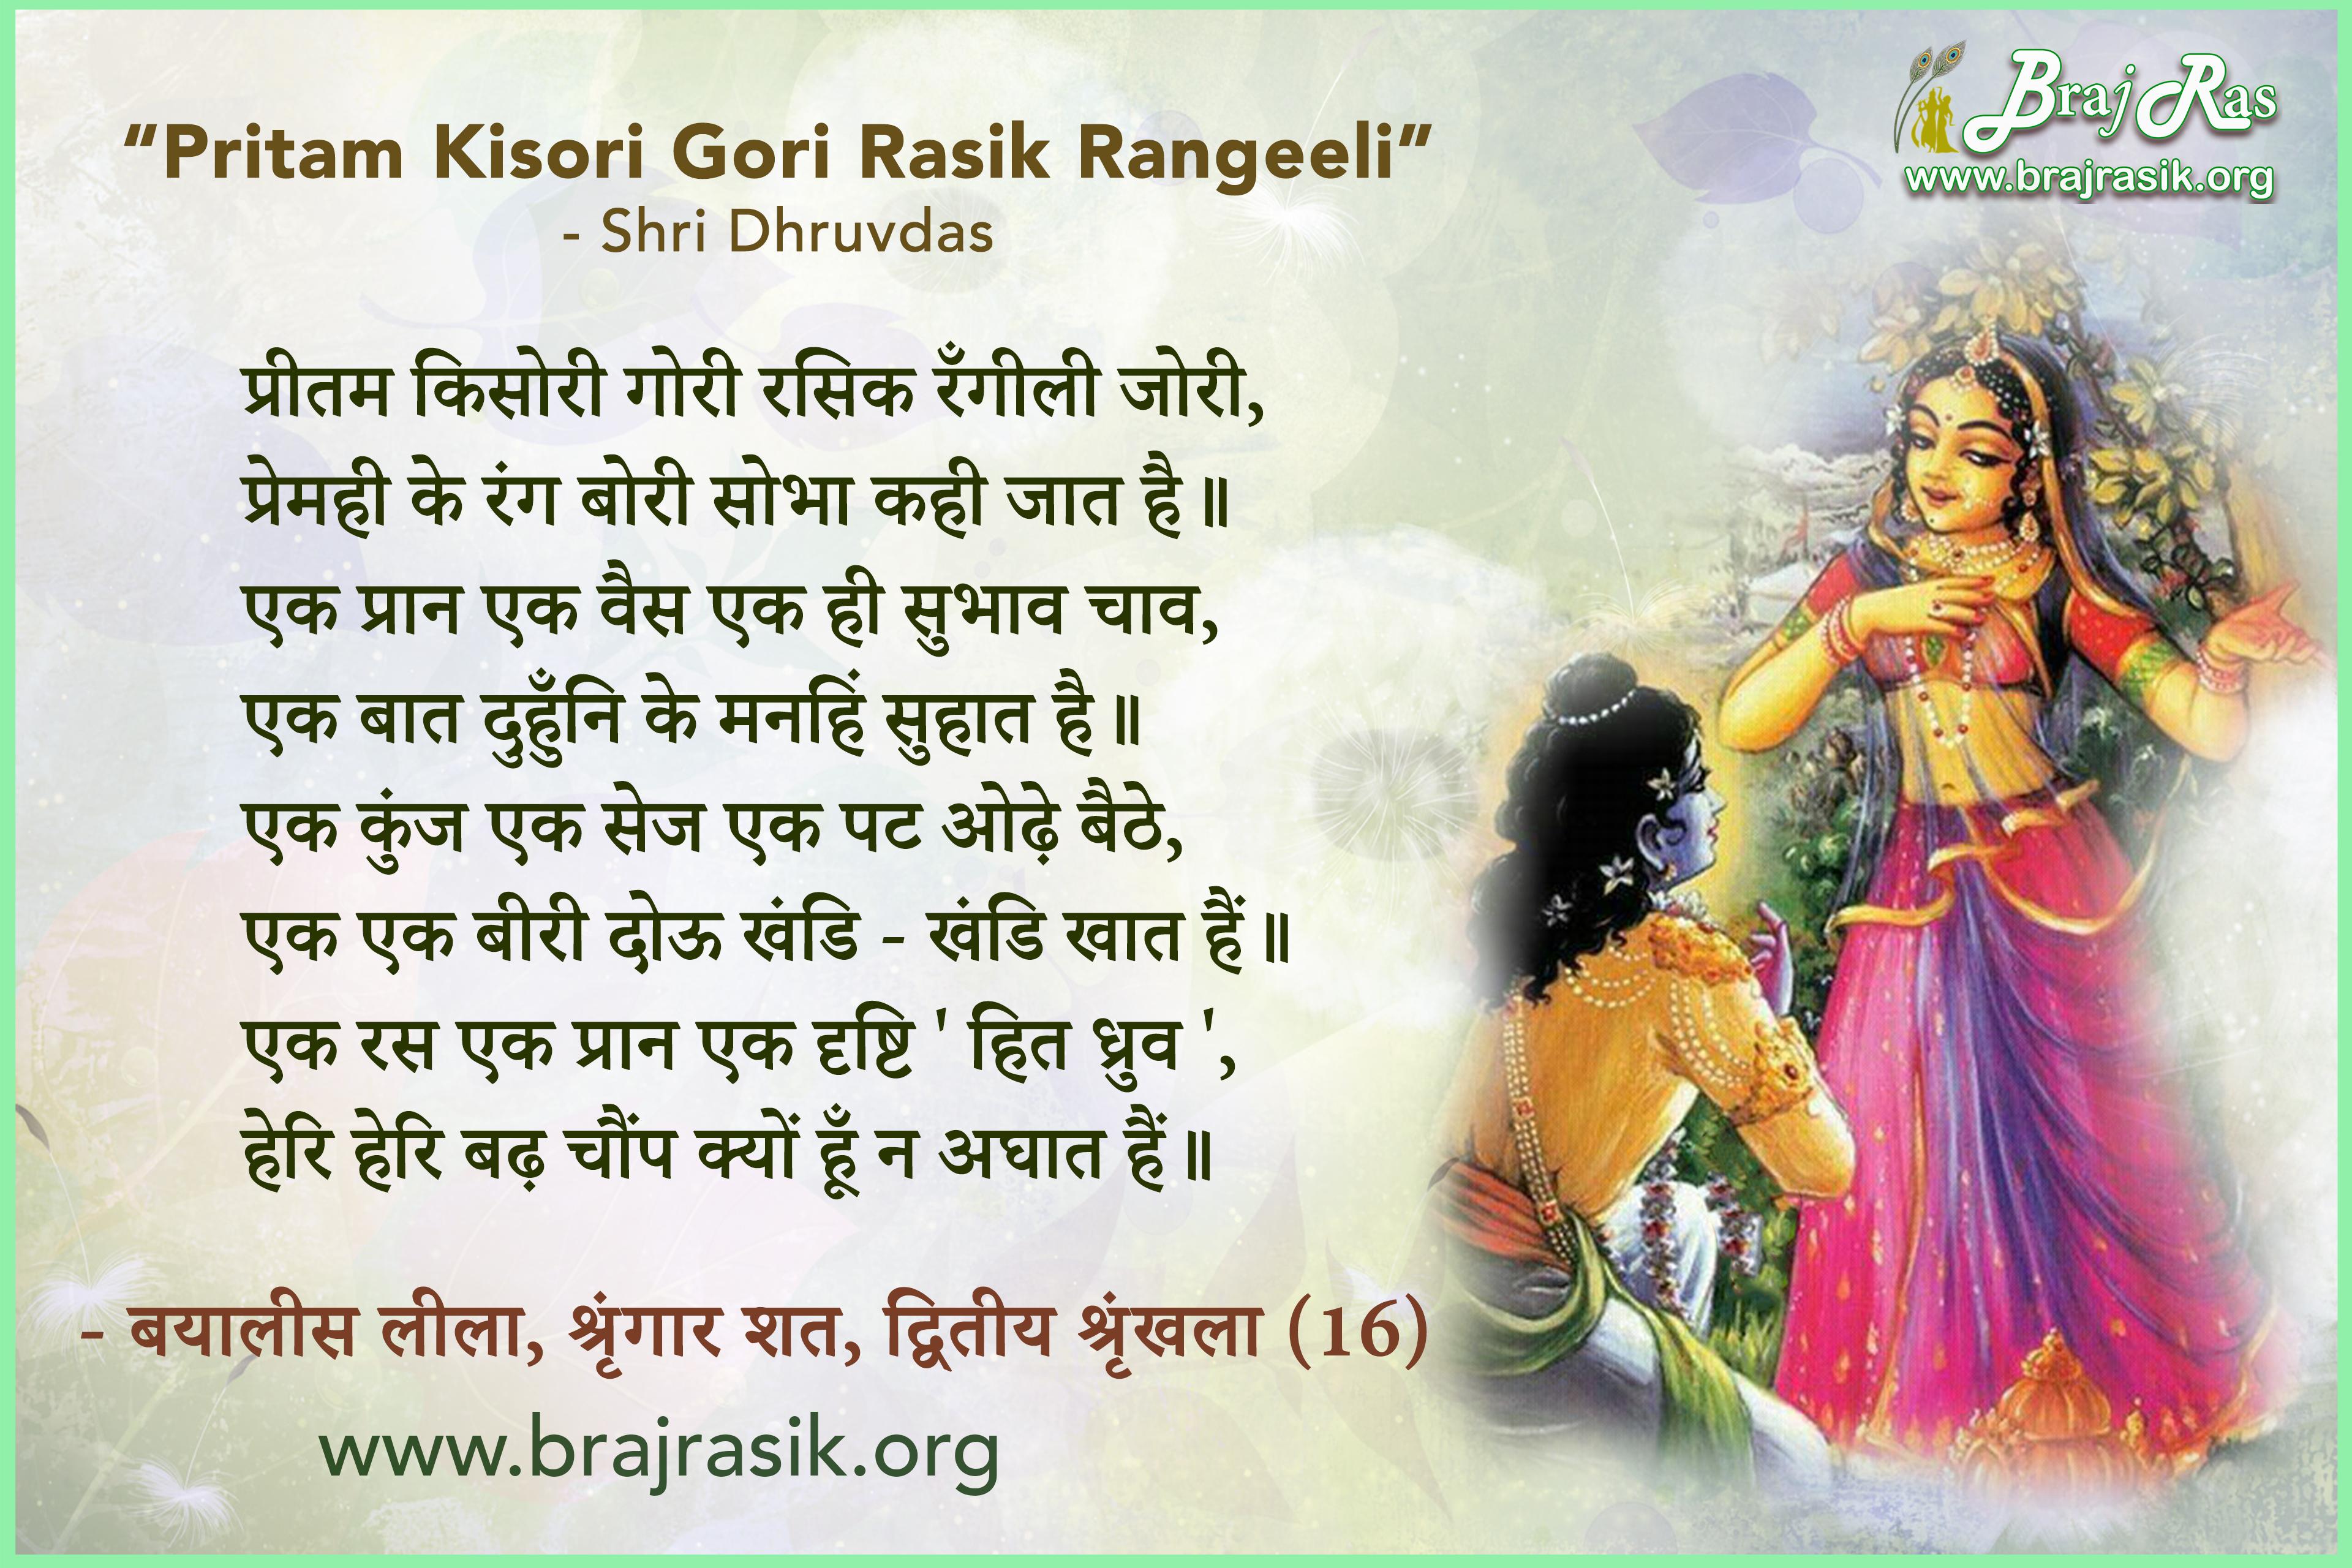 Pritam Kisori Gori Rasik Rangili Jori -Shri Dhruvdas